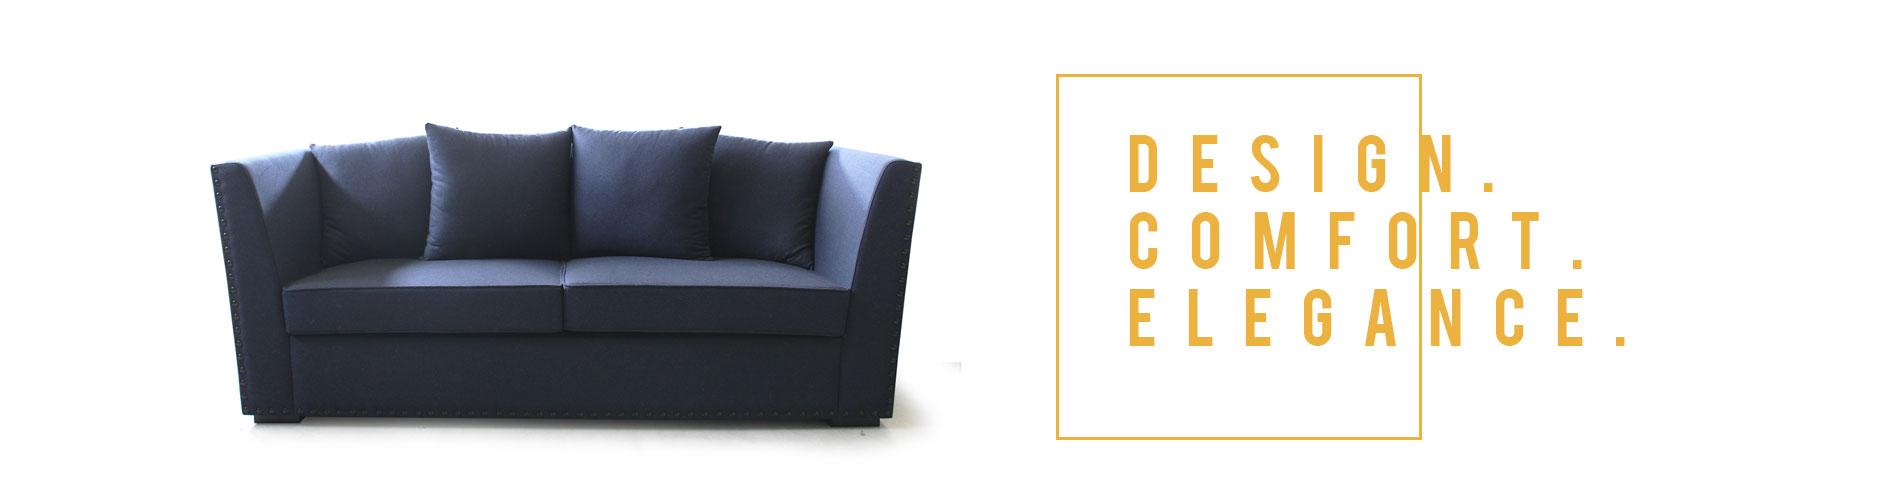 Induflex Upholstered Furniture # Muebles Mato Sofas